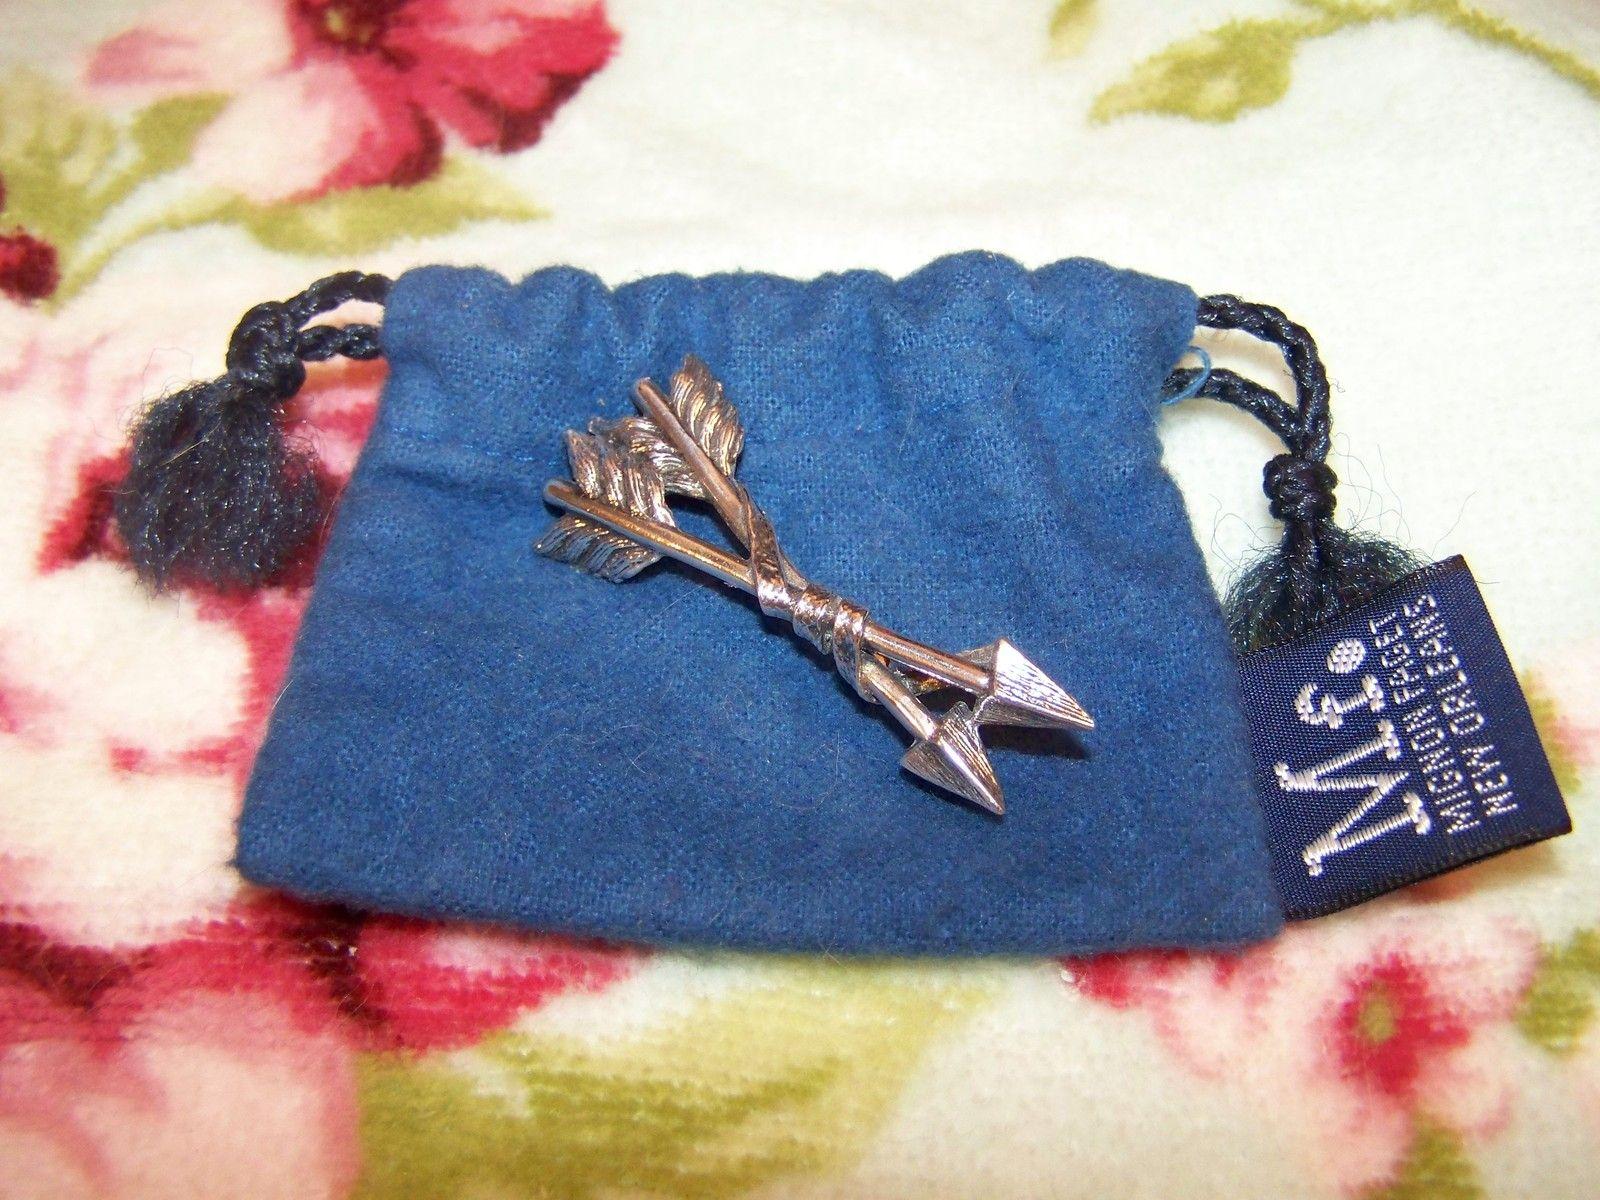 Mignon Faget MF Sterling Silver Cupid's Arrow Double Arrows Pin New Orleans NOLA -